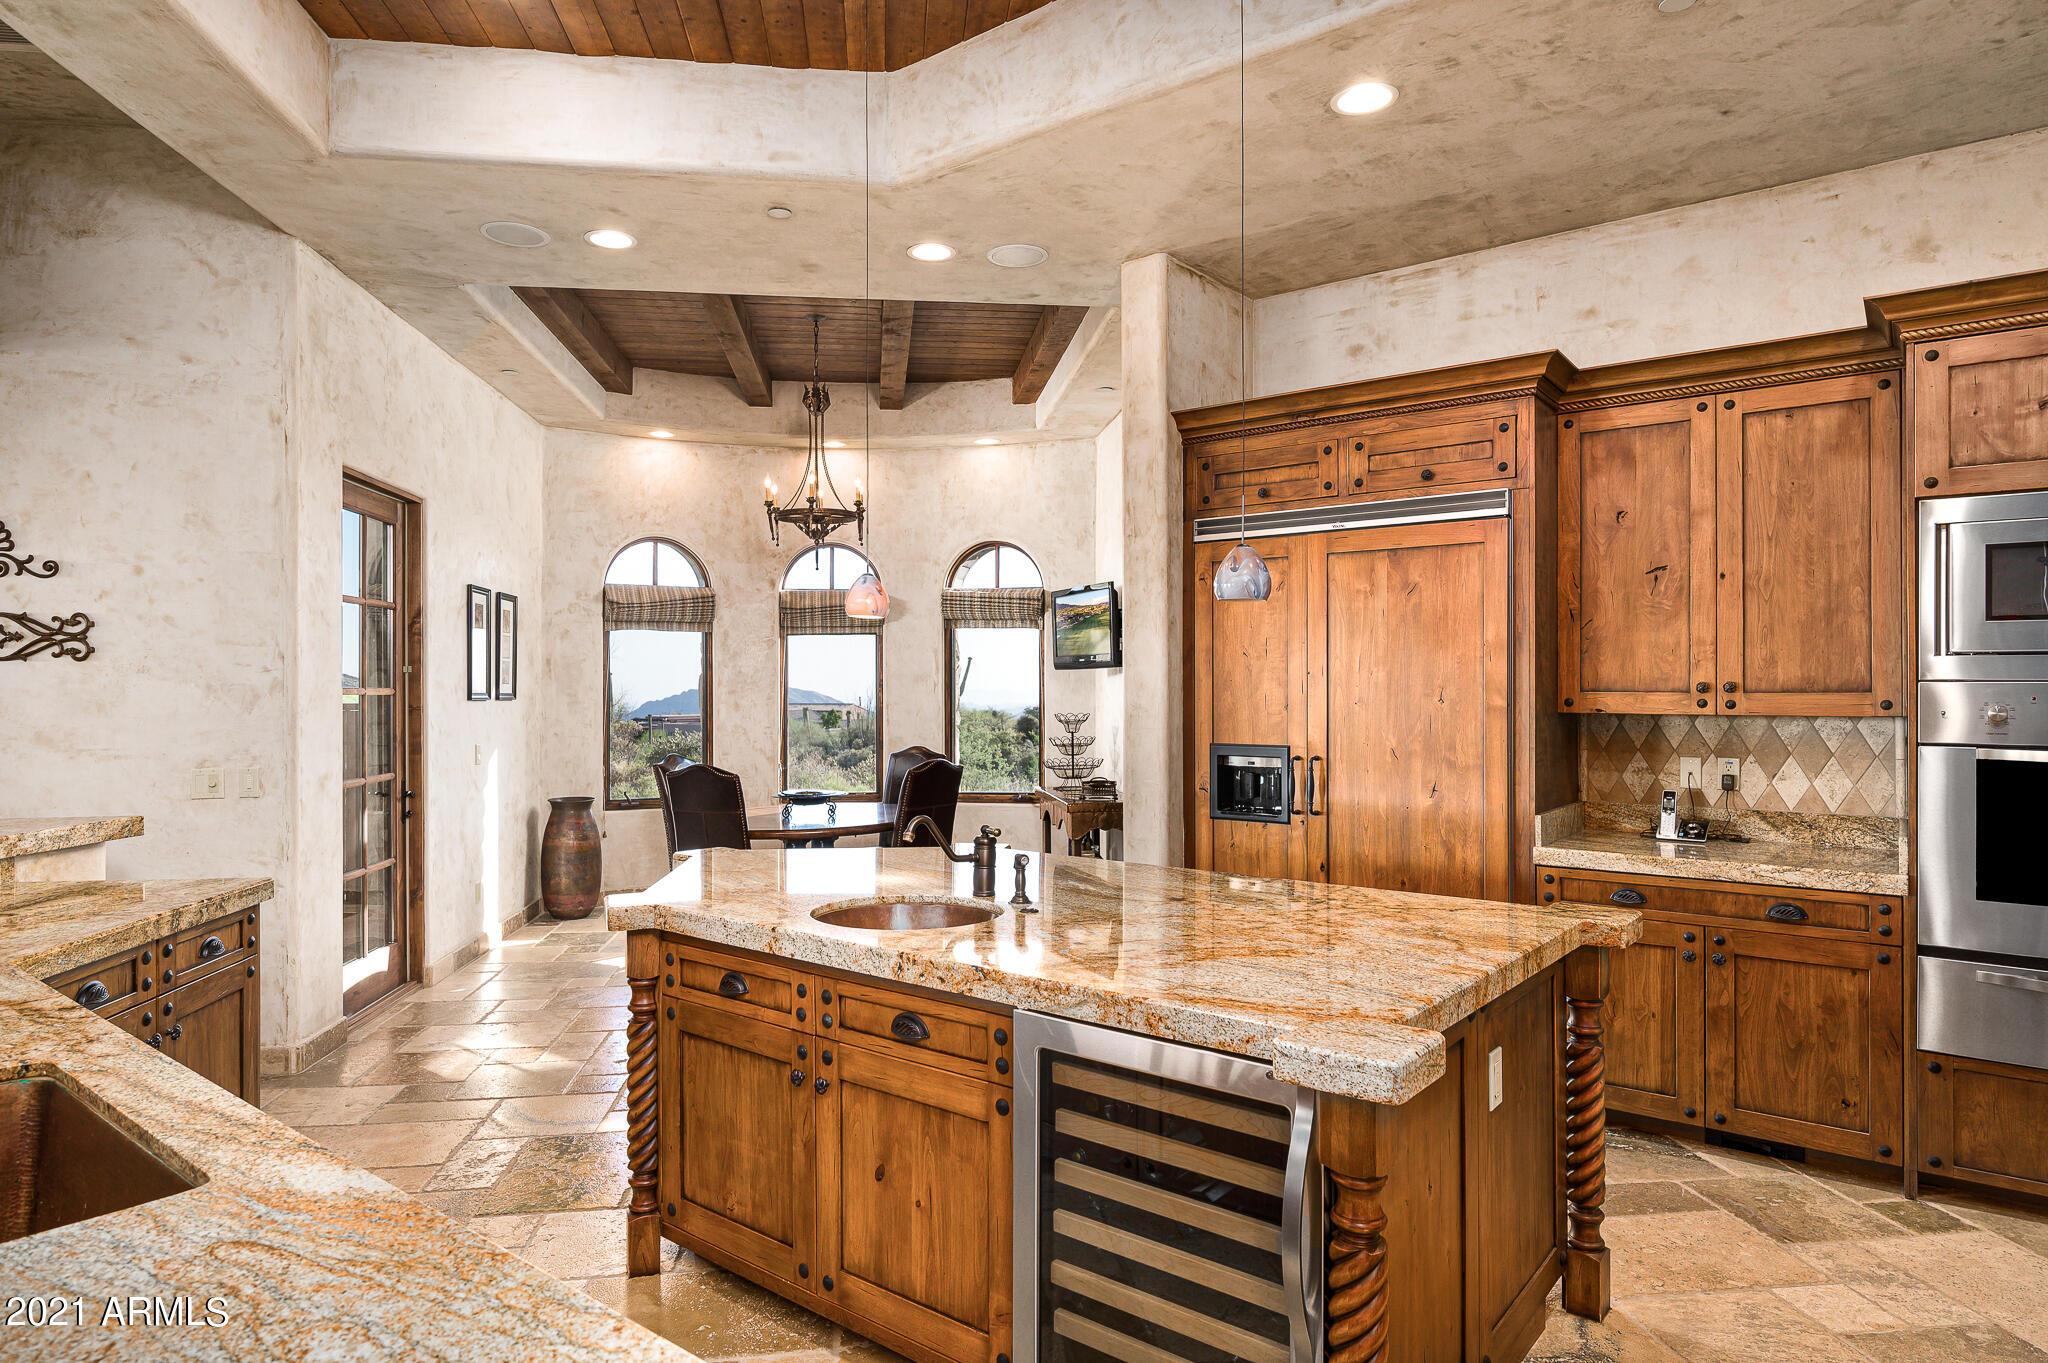 42007 101ST Way, Scottsdale, Arizona 85262, 5 Bedrooms Bedrooms, ,5.5 BathroomsBathrooms,Residential,For Sale,101ST,6242177